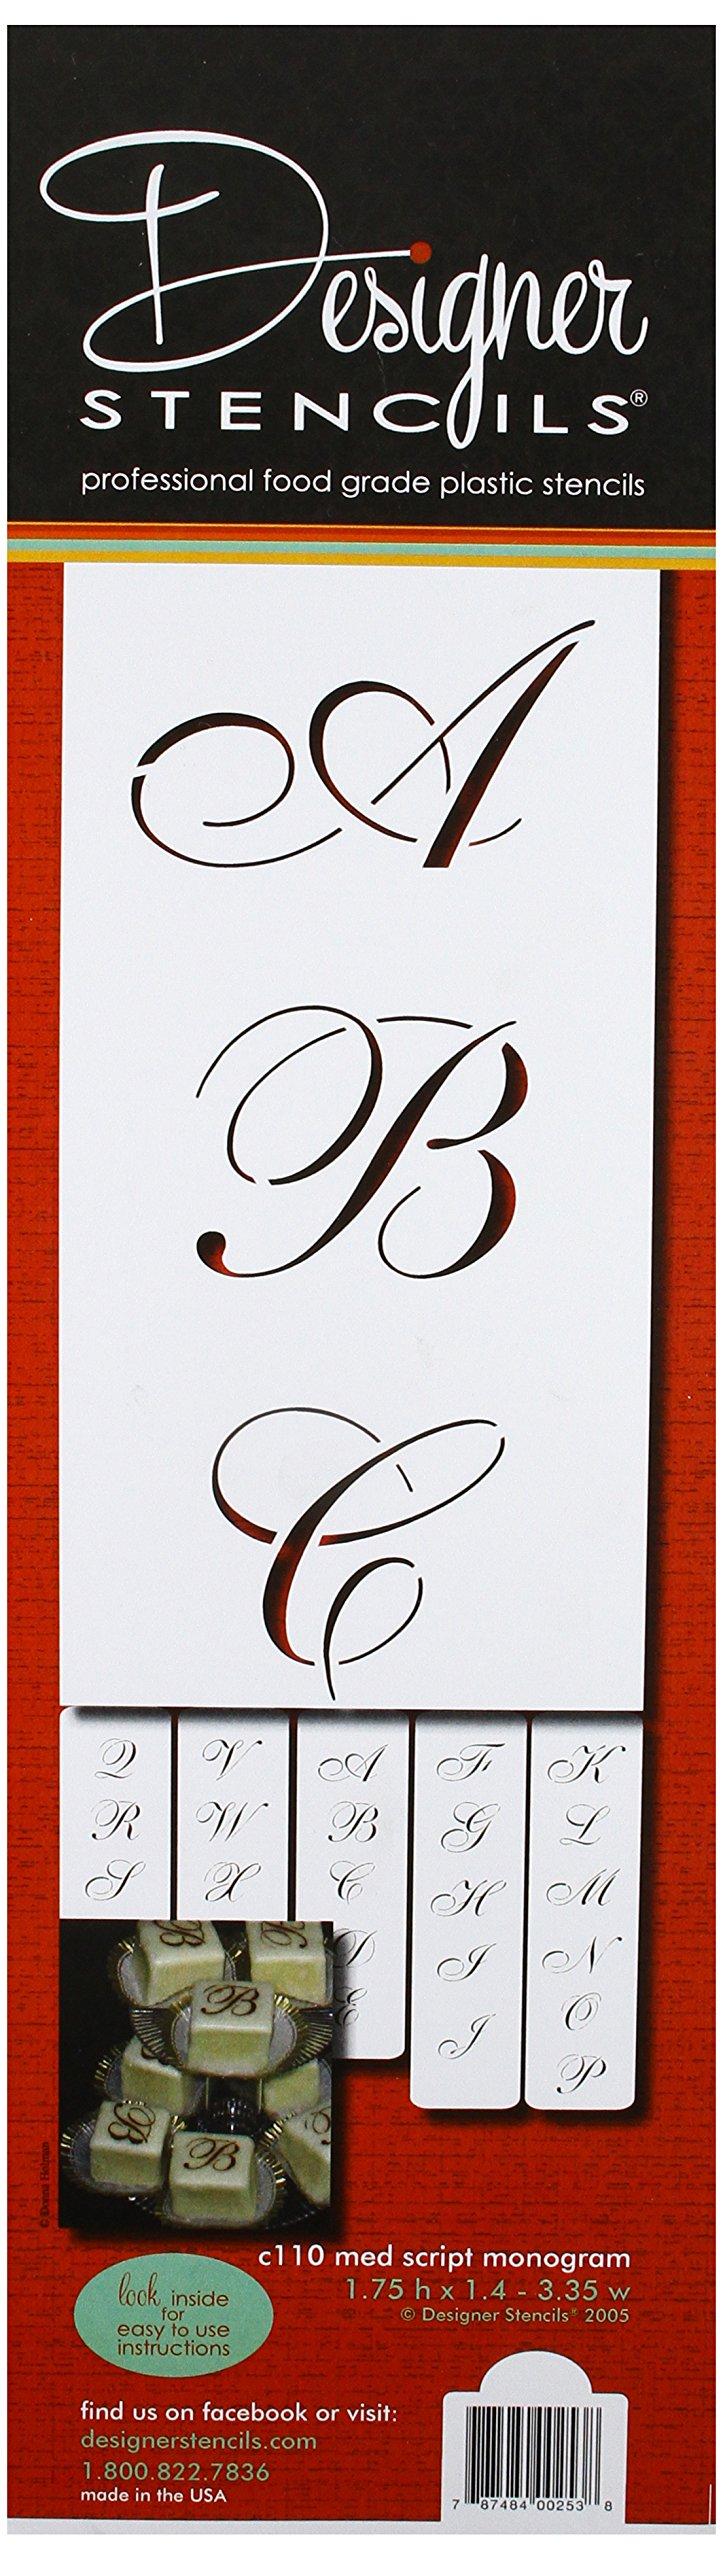 Designer Stencils C110 1.75 Inch Script Monogram foodgrade stencil, 1.75 x 1.4-3.35